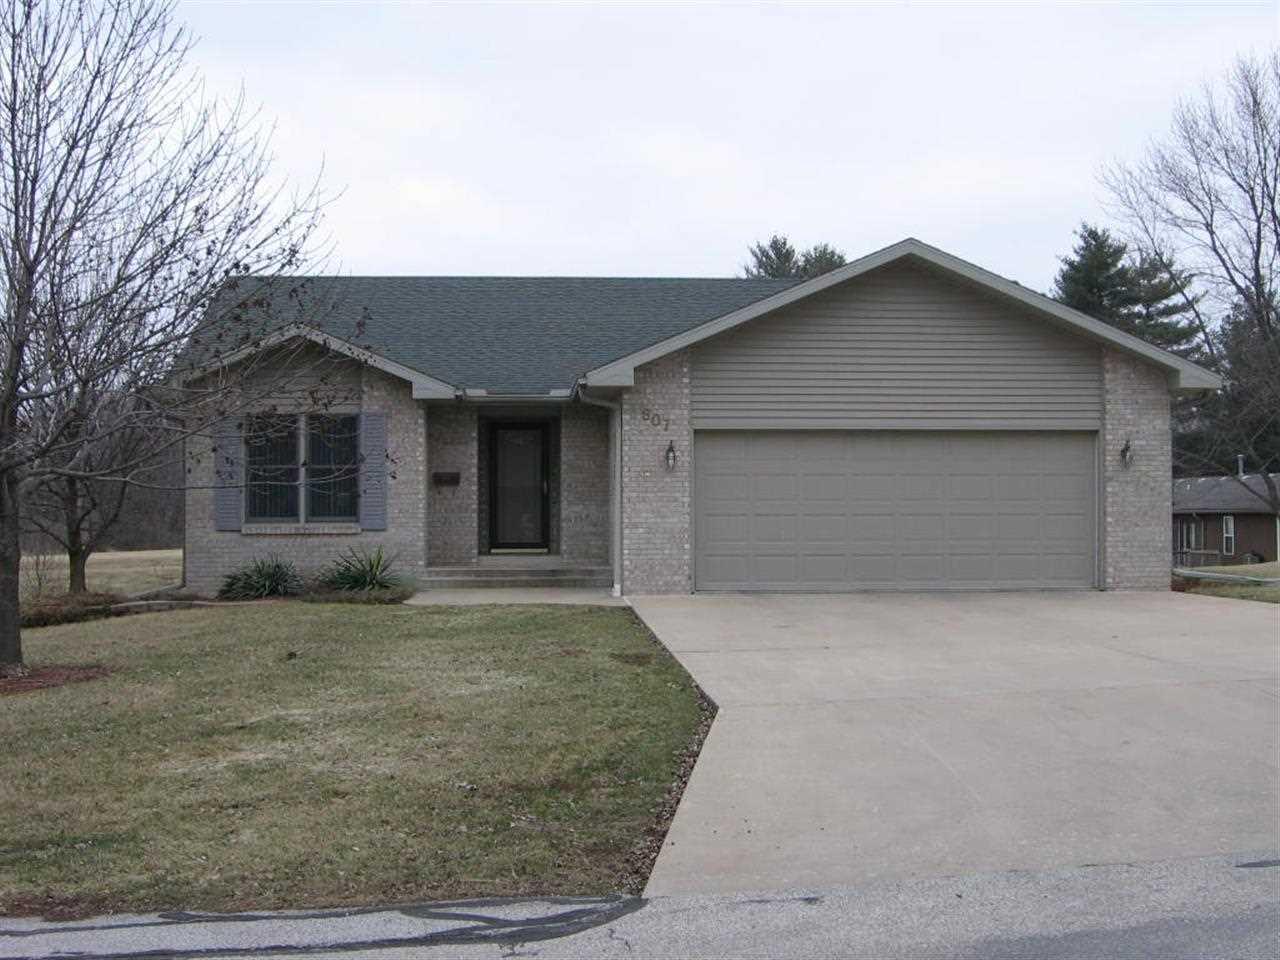 Real Estate for Sale, ListingId: 30808190, MacOmb,IL61455